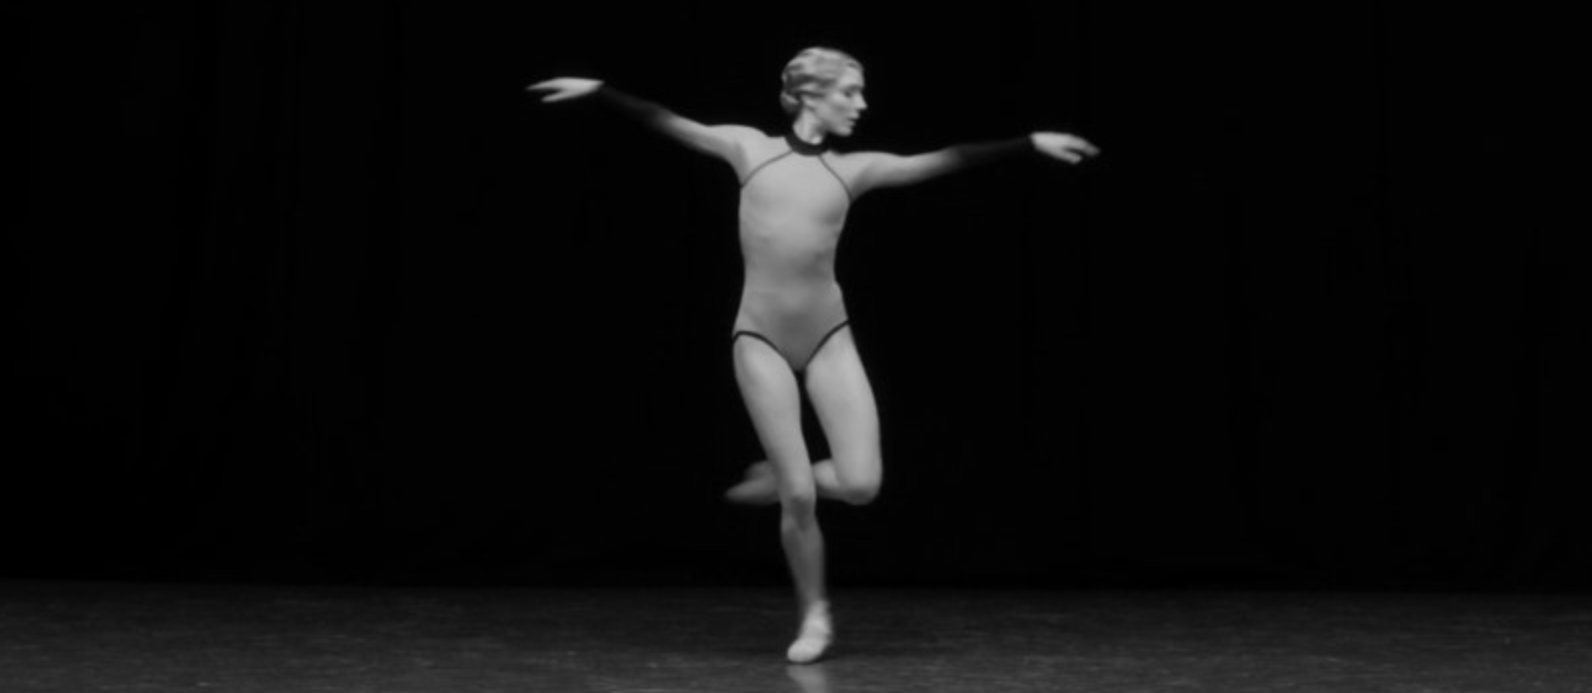 female artist ballerina sarah lamb portrait